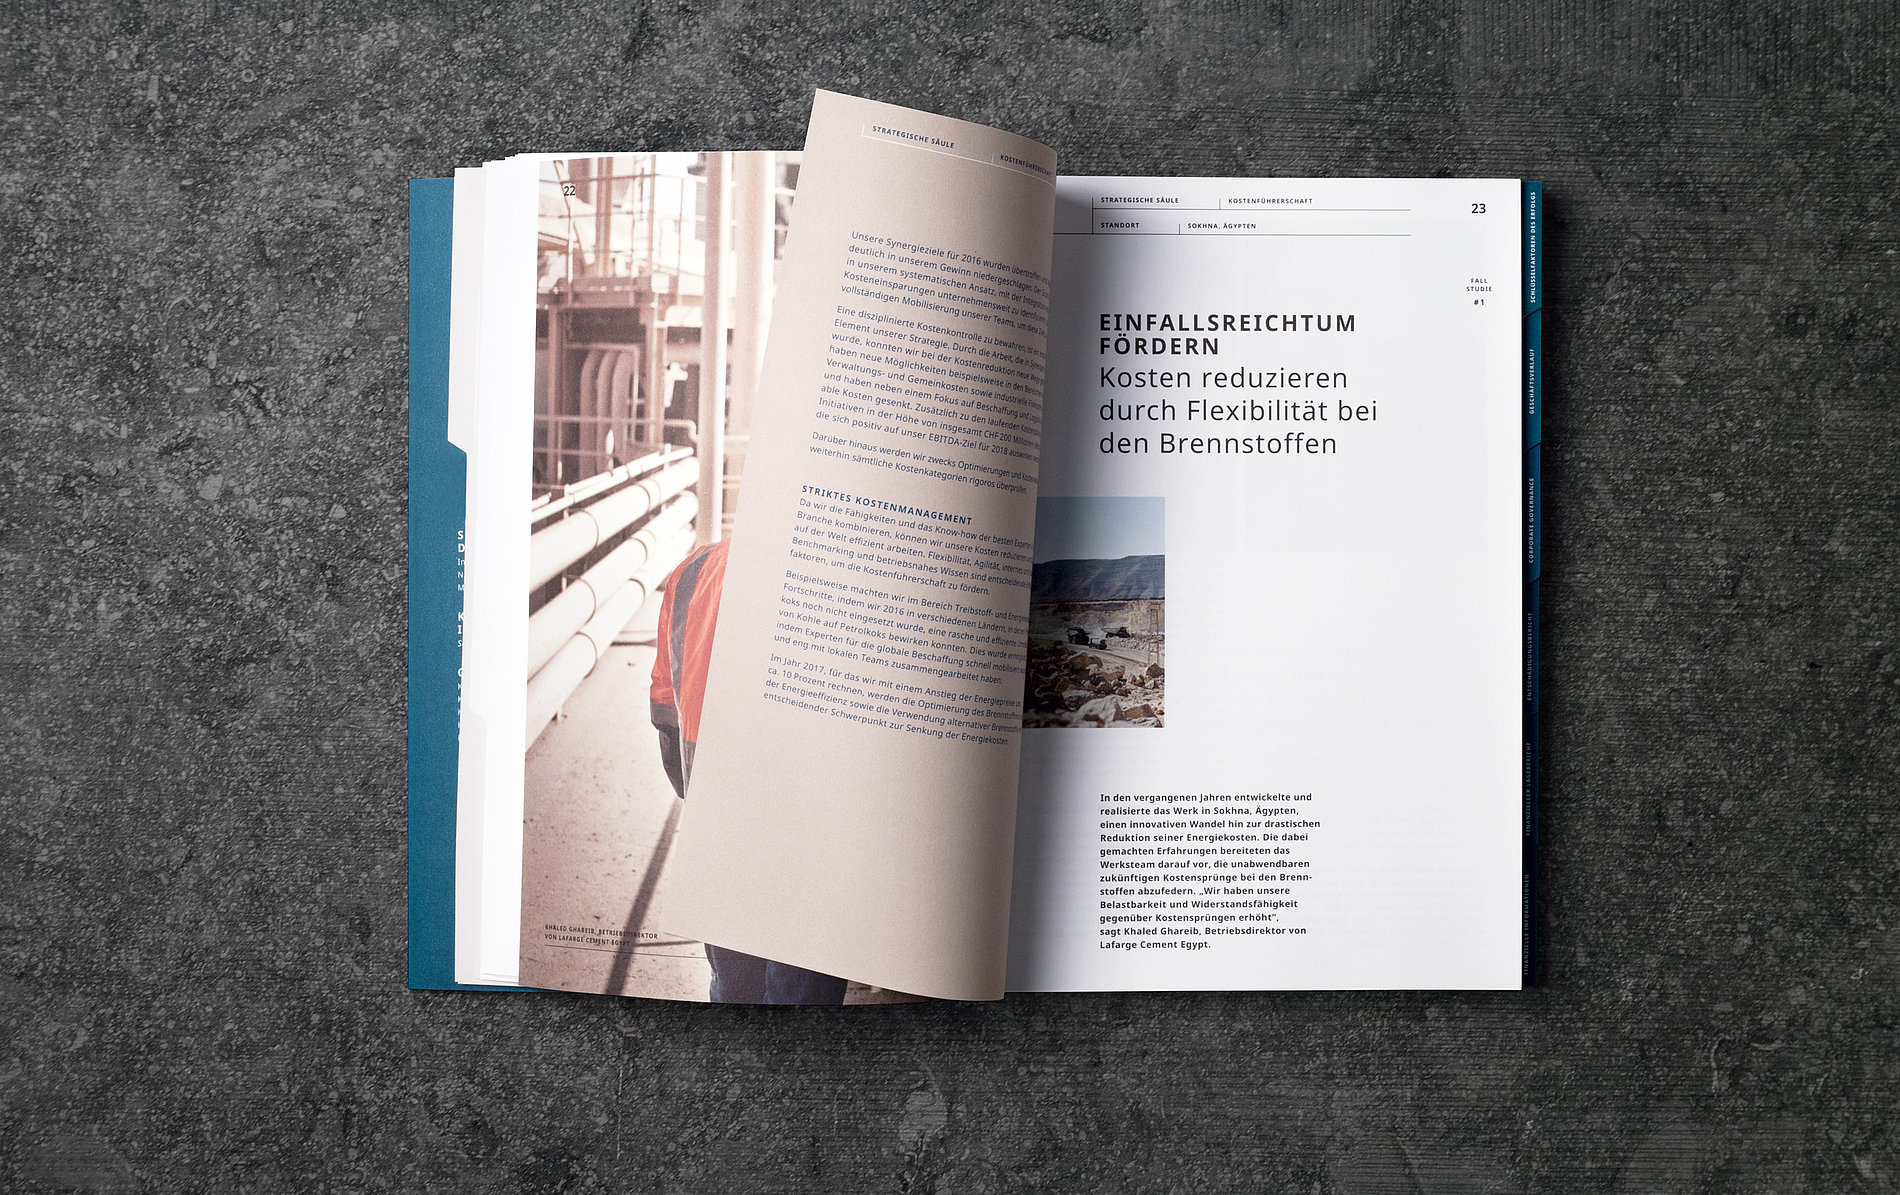 LafargeHolcim Annual Report 2016 | Red Dot Design Award